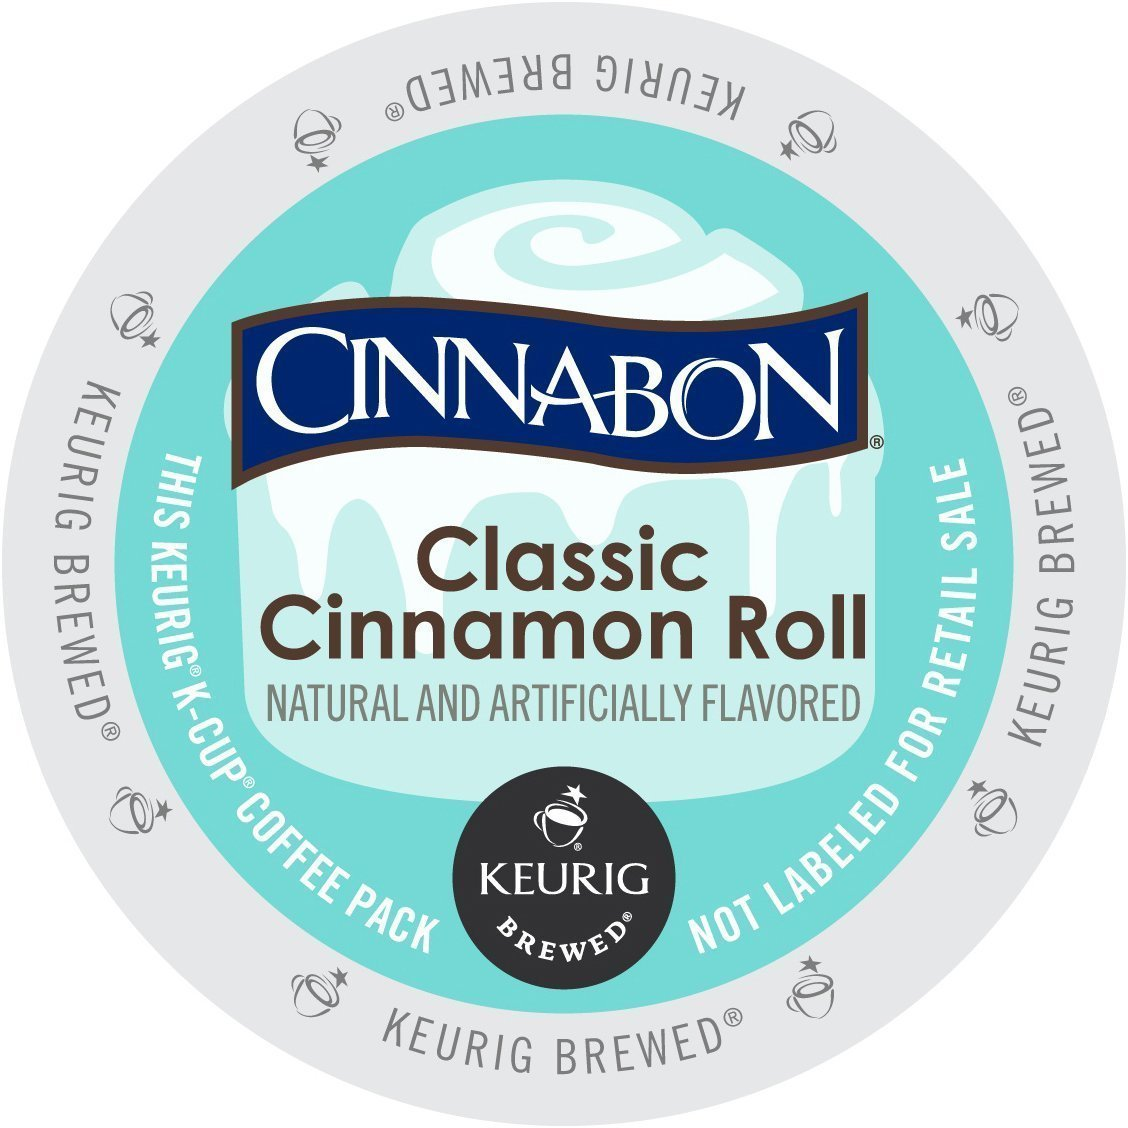 Cinnabon Classic Cinnamon Roll K-Cup Coffee (96 count) by Cinnabon